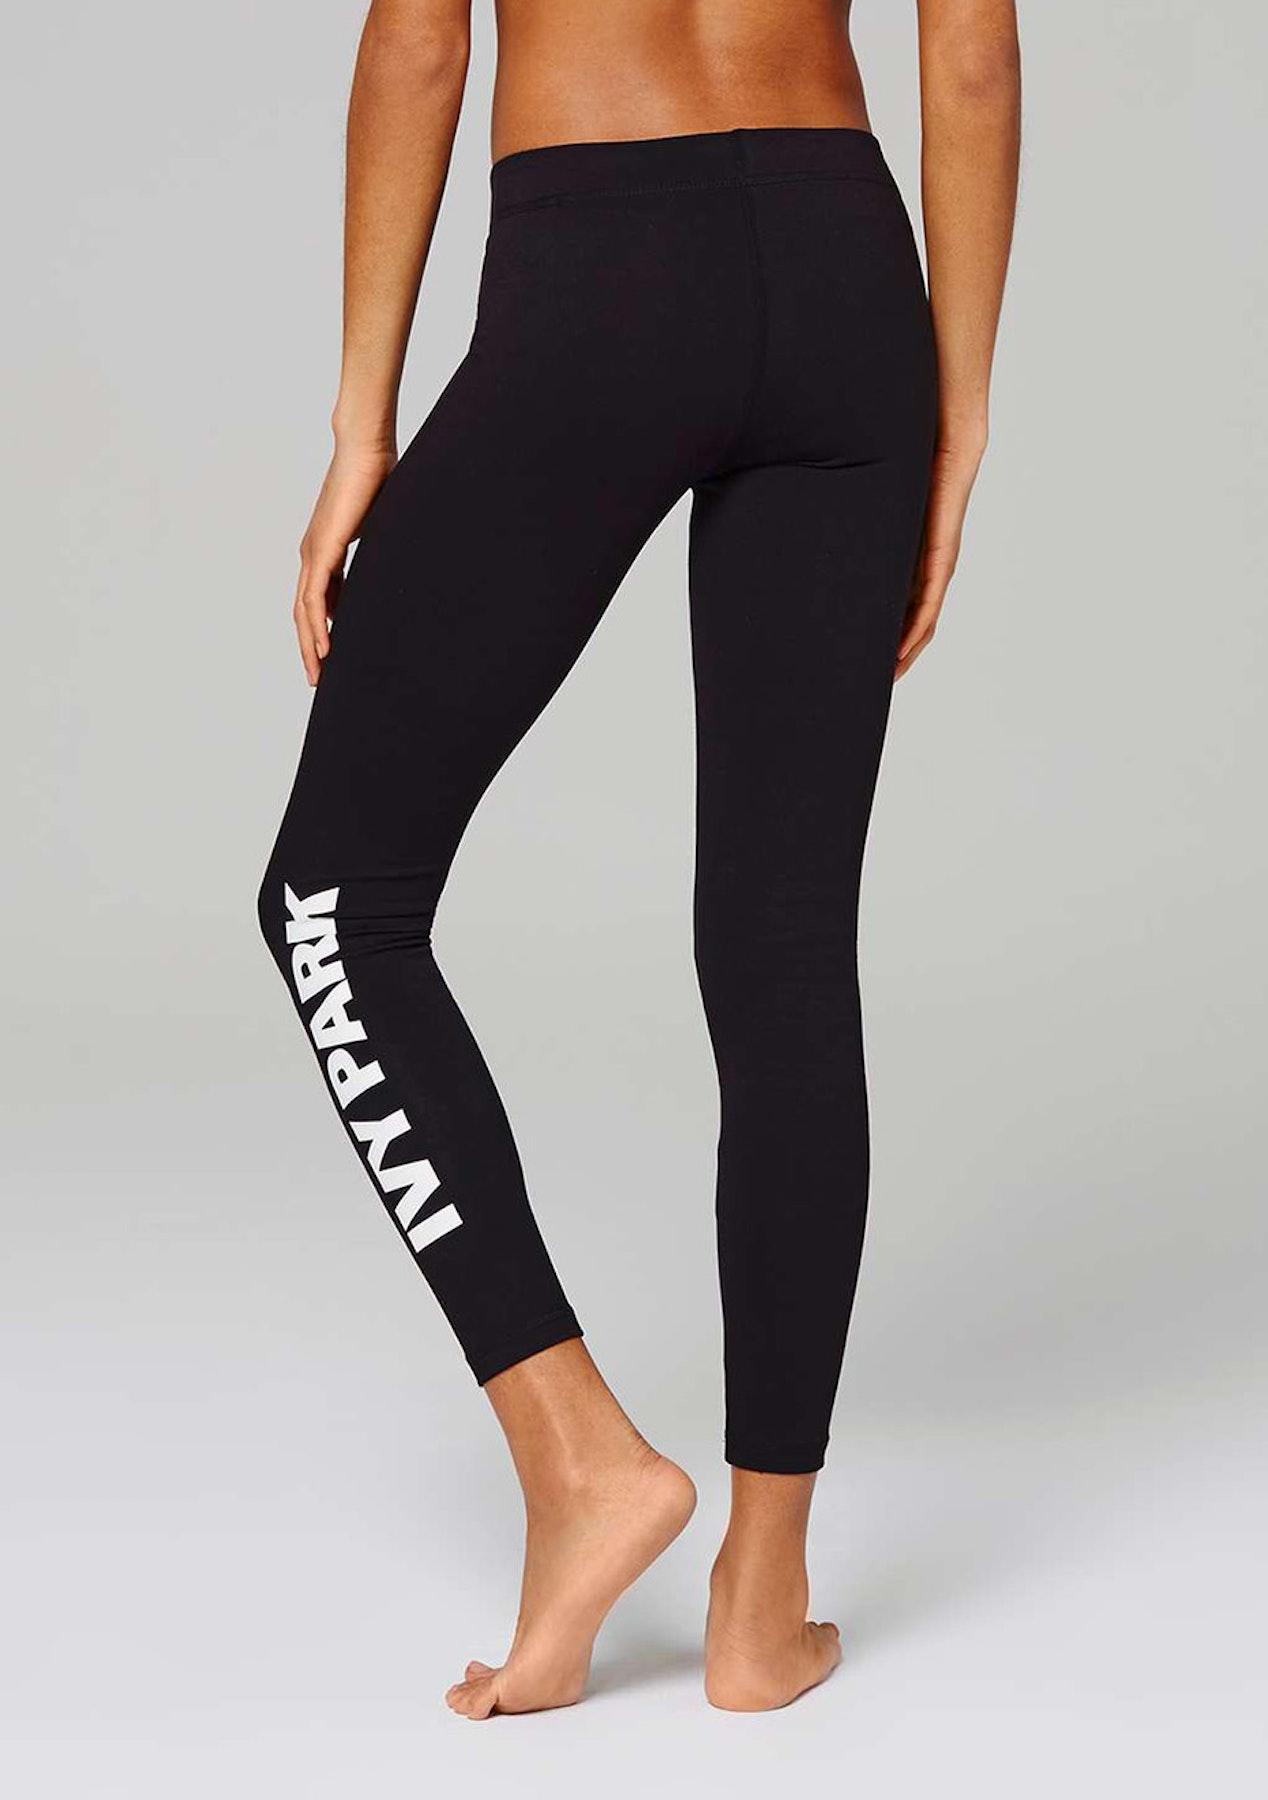 720582cdda8d0 Ivy Park - Mid Rise Logo Legging - Black - New IVY PARK - Onceit